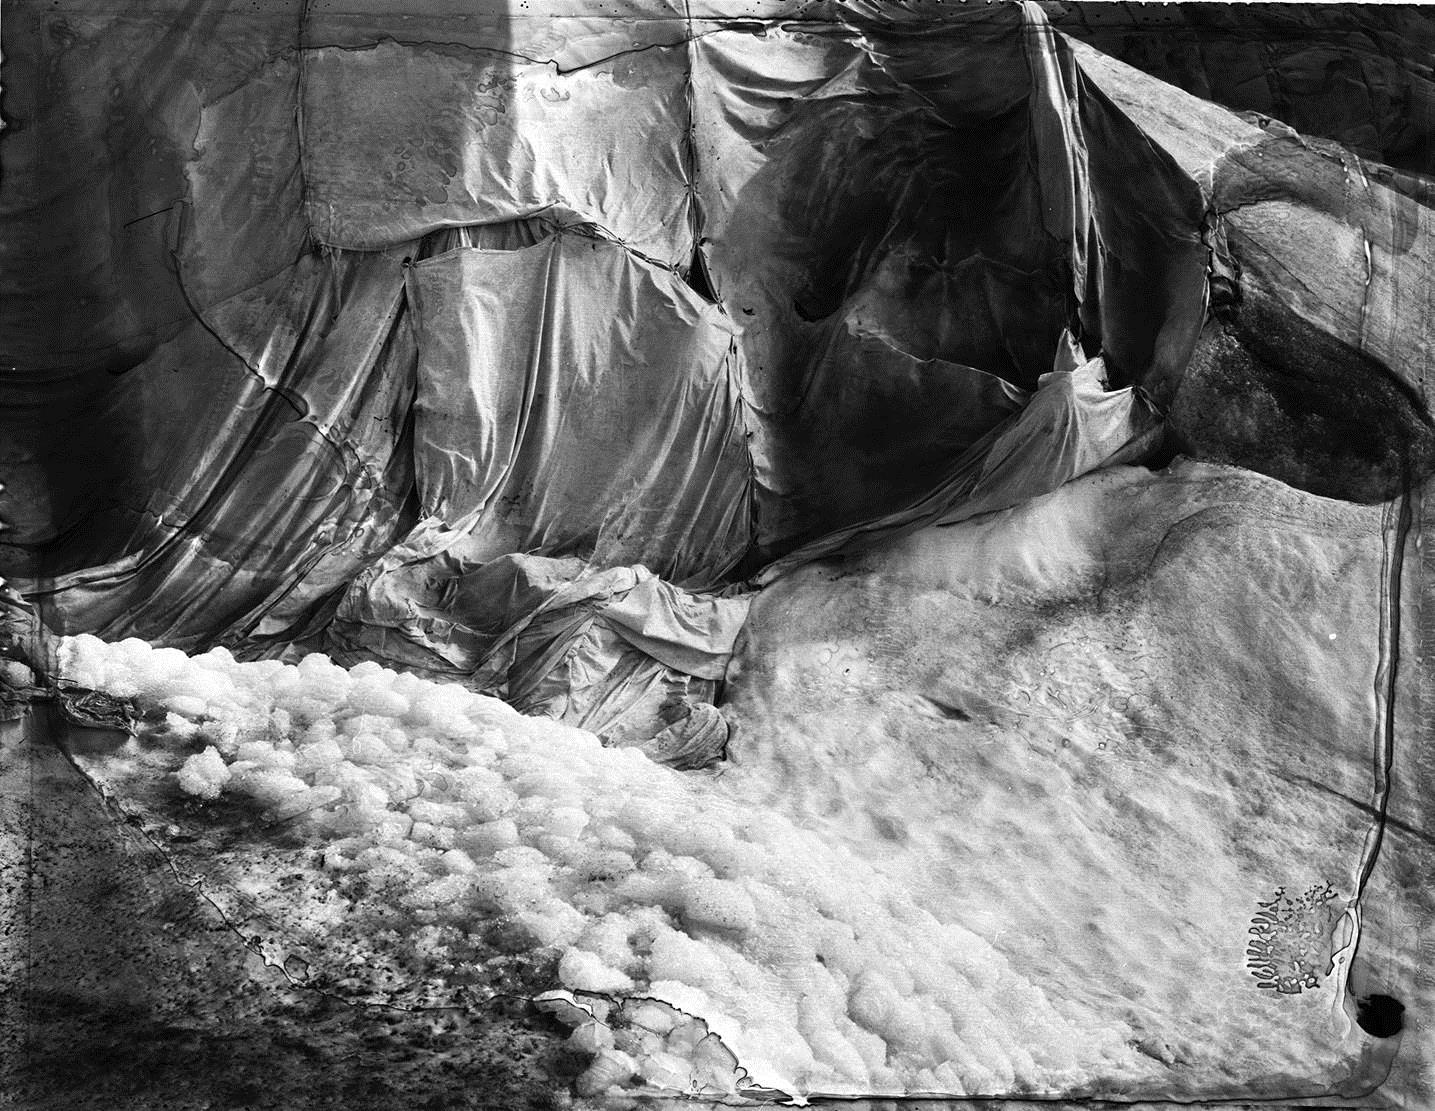 Fotografia d'Ester Vonplon: Gletschermilch, 2013.